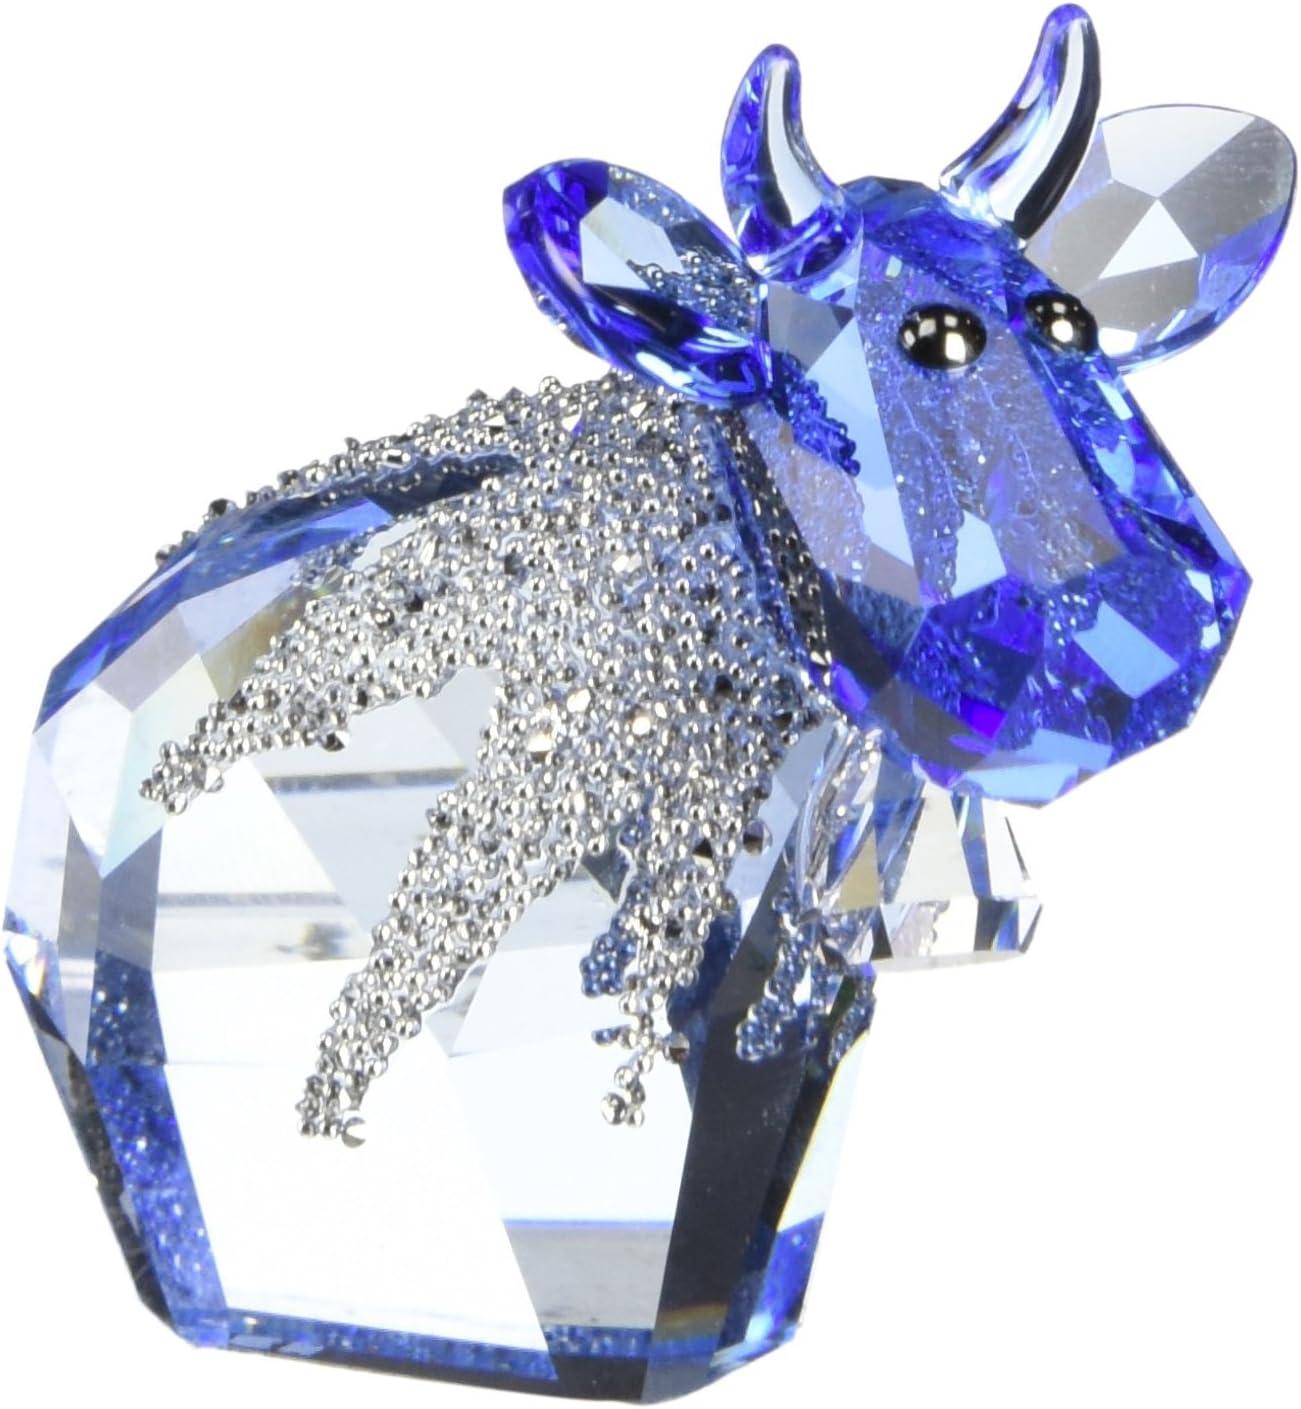 SWAROVSKI Ice Mo Figurine, Limited Edition 2015